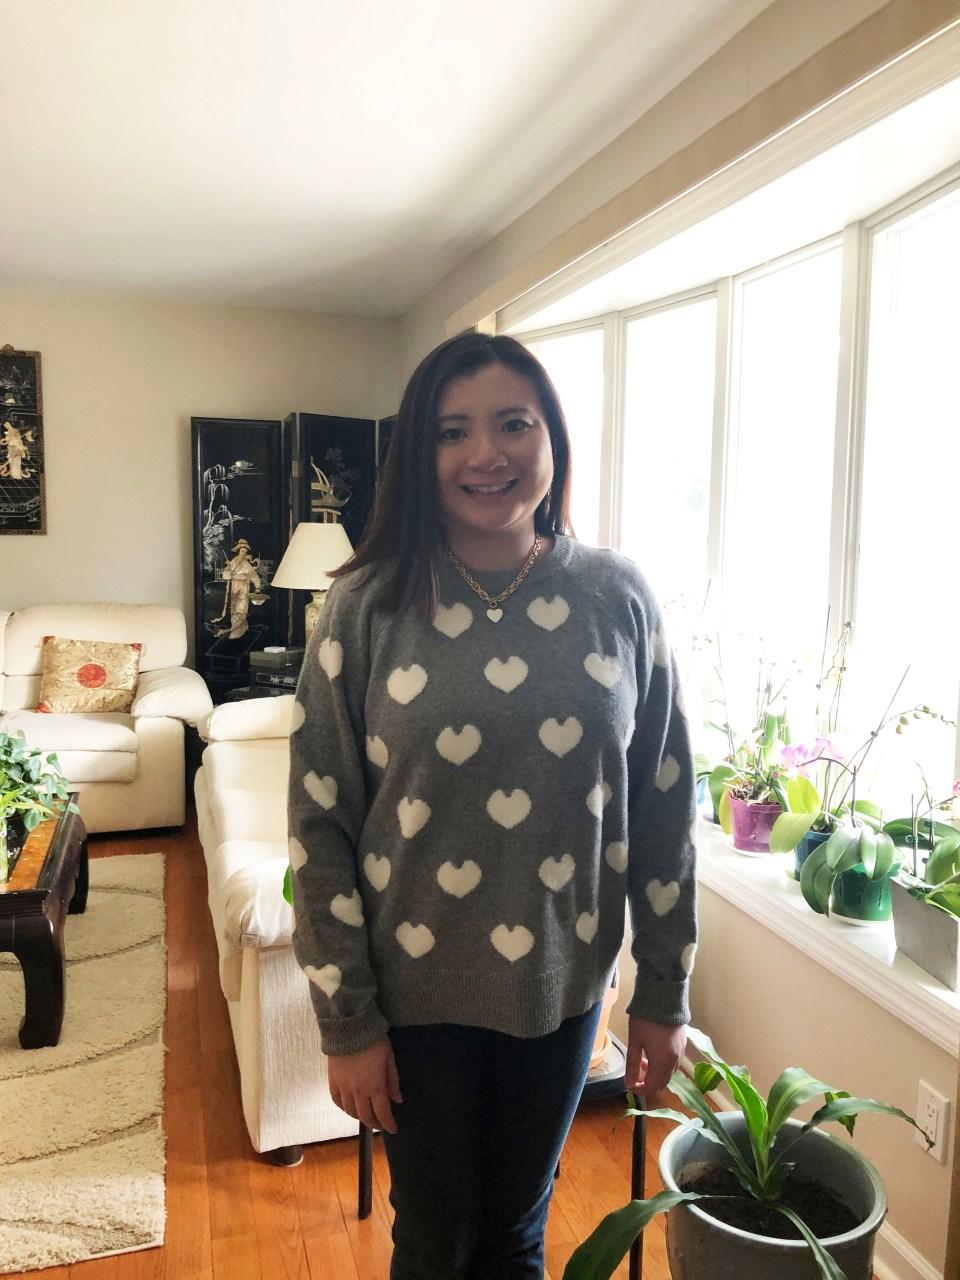 White Heart Sweater 2